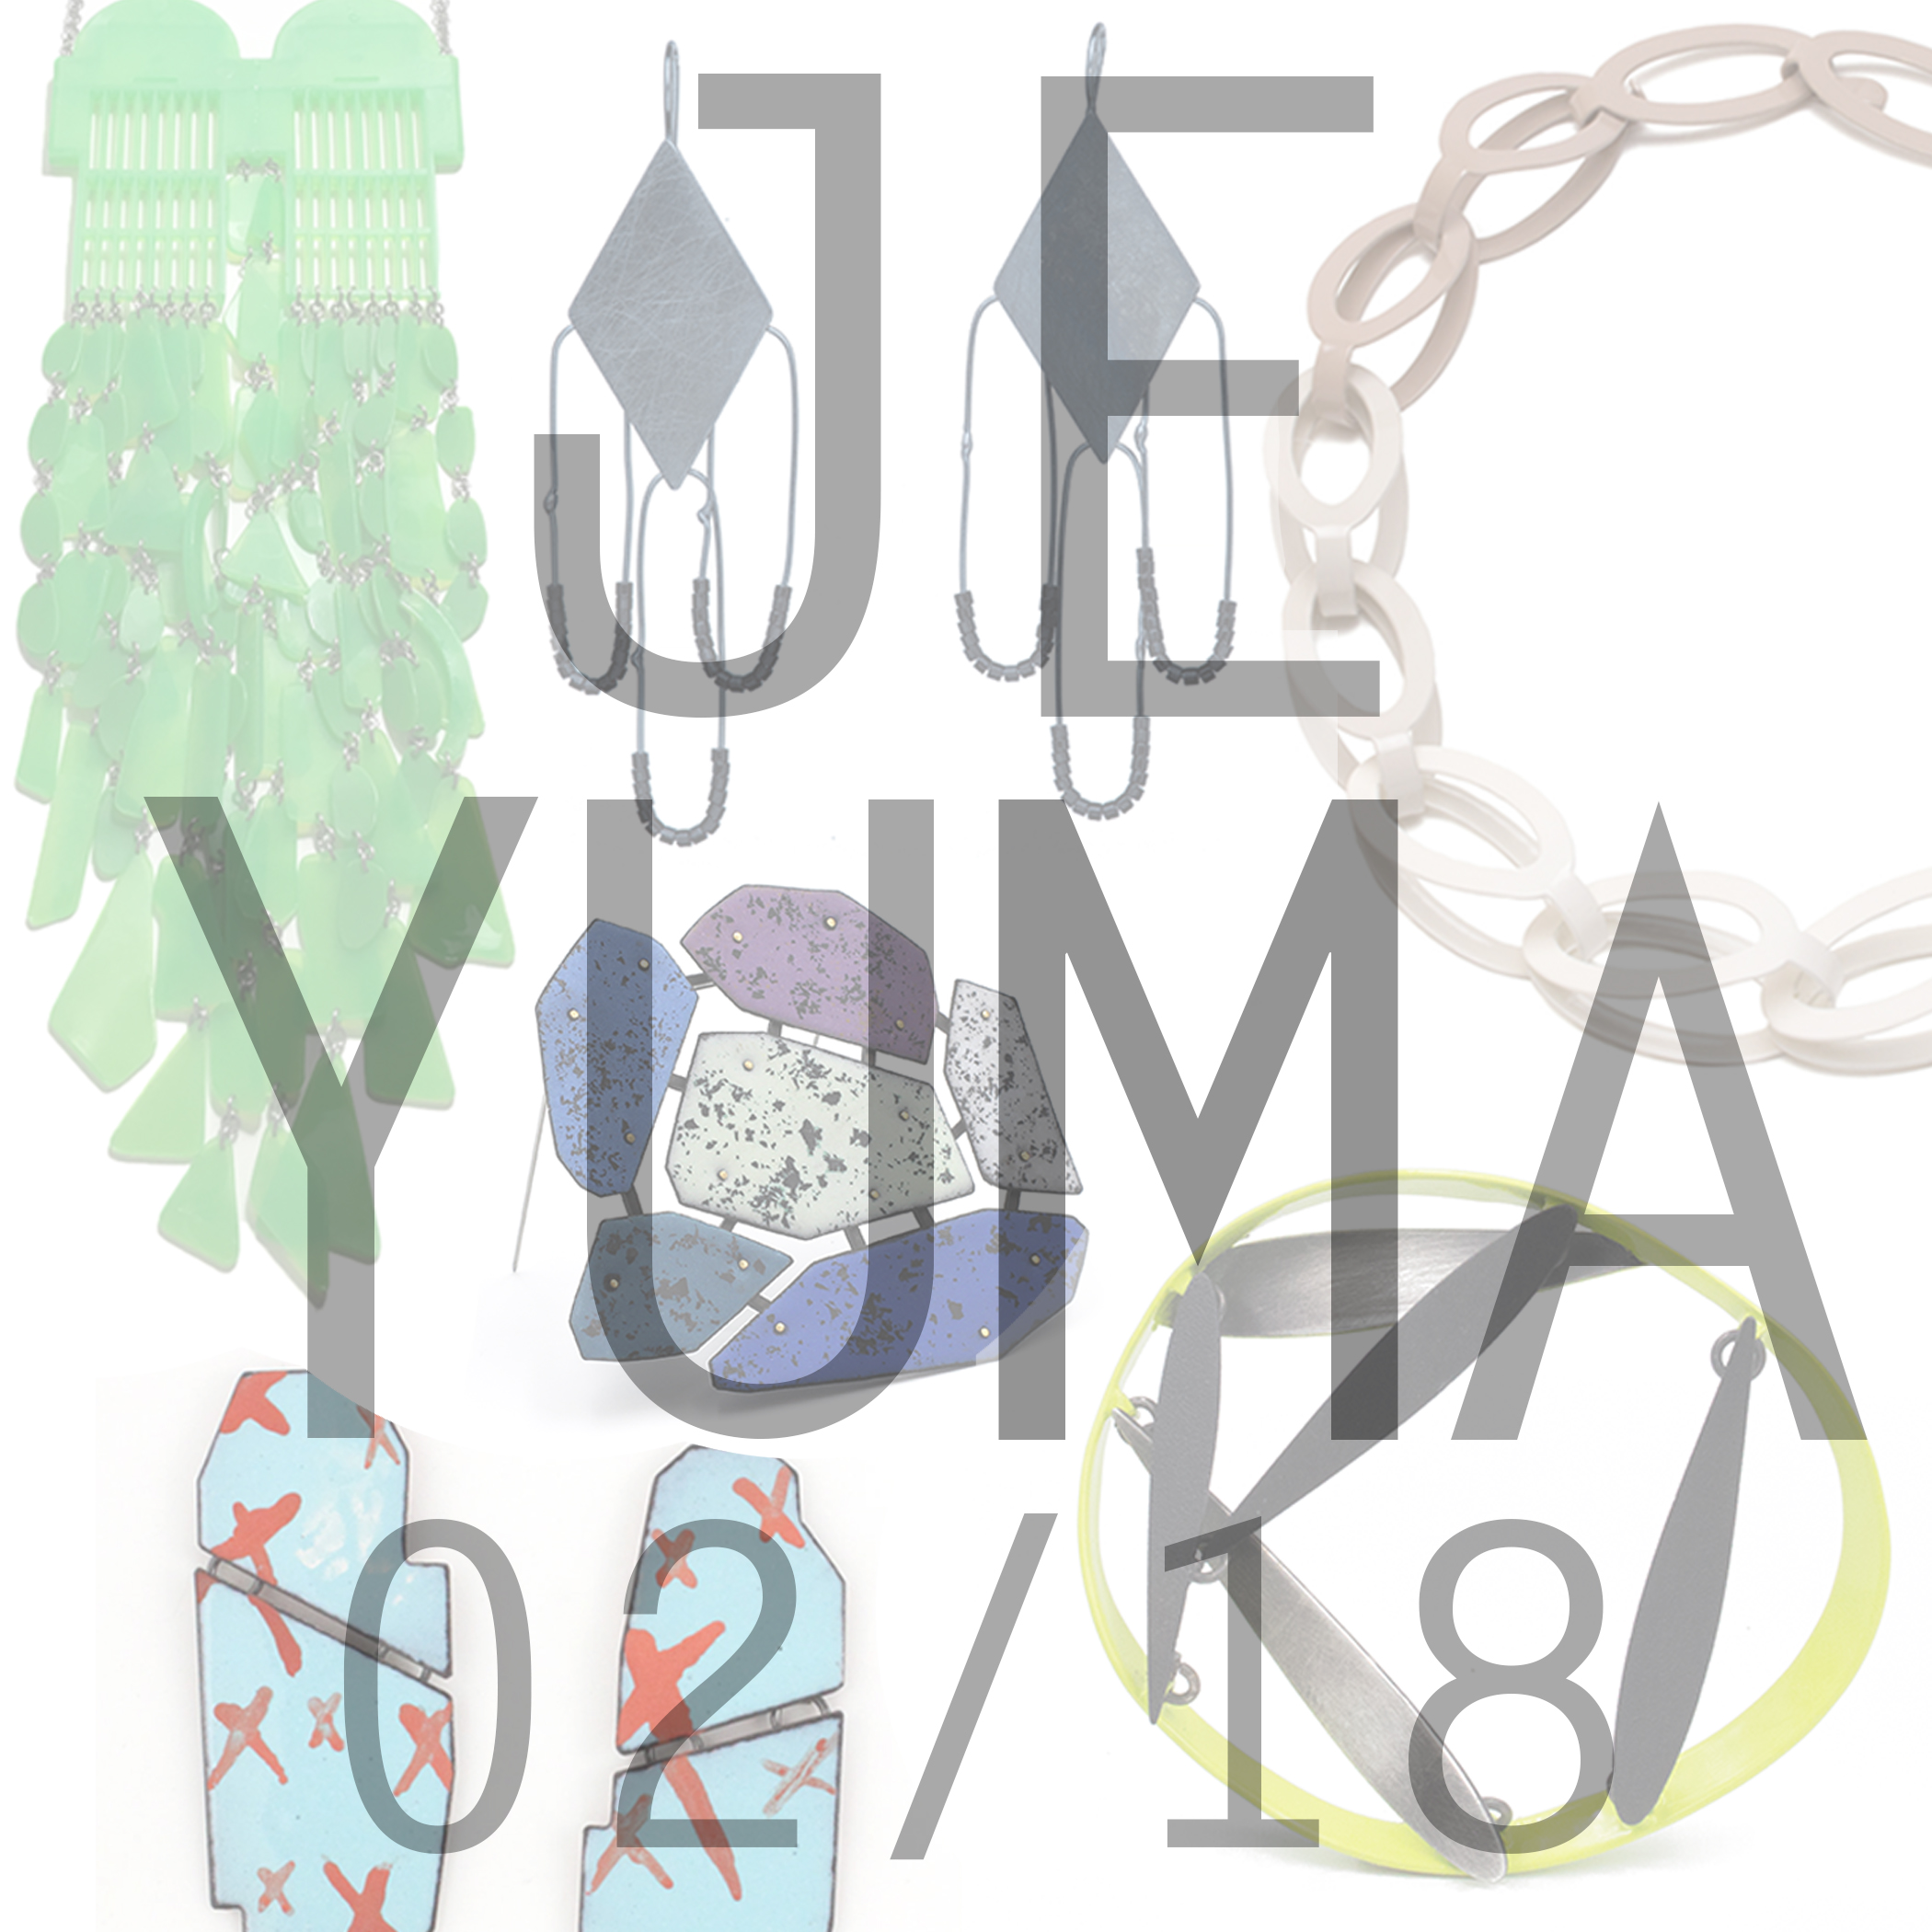 JEYUMA_2018.jpg